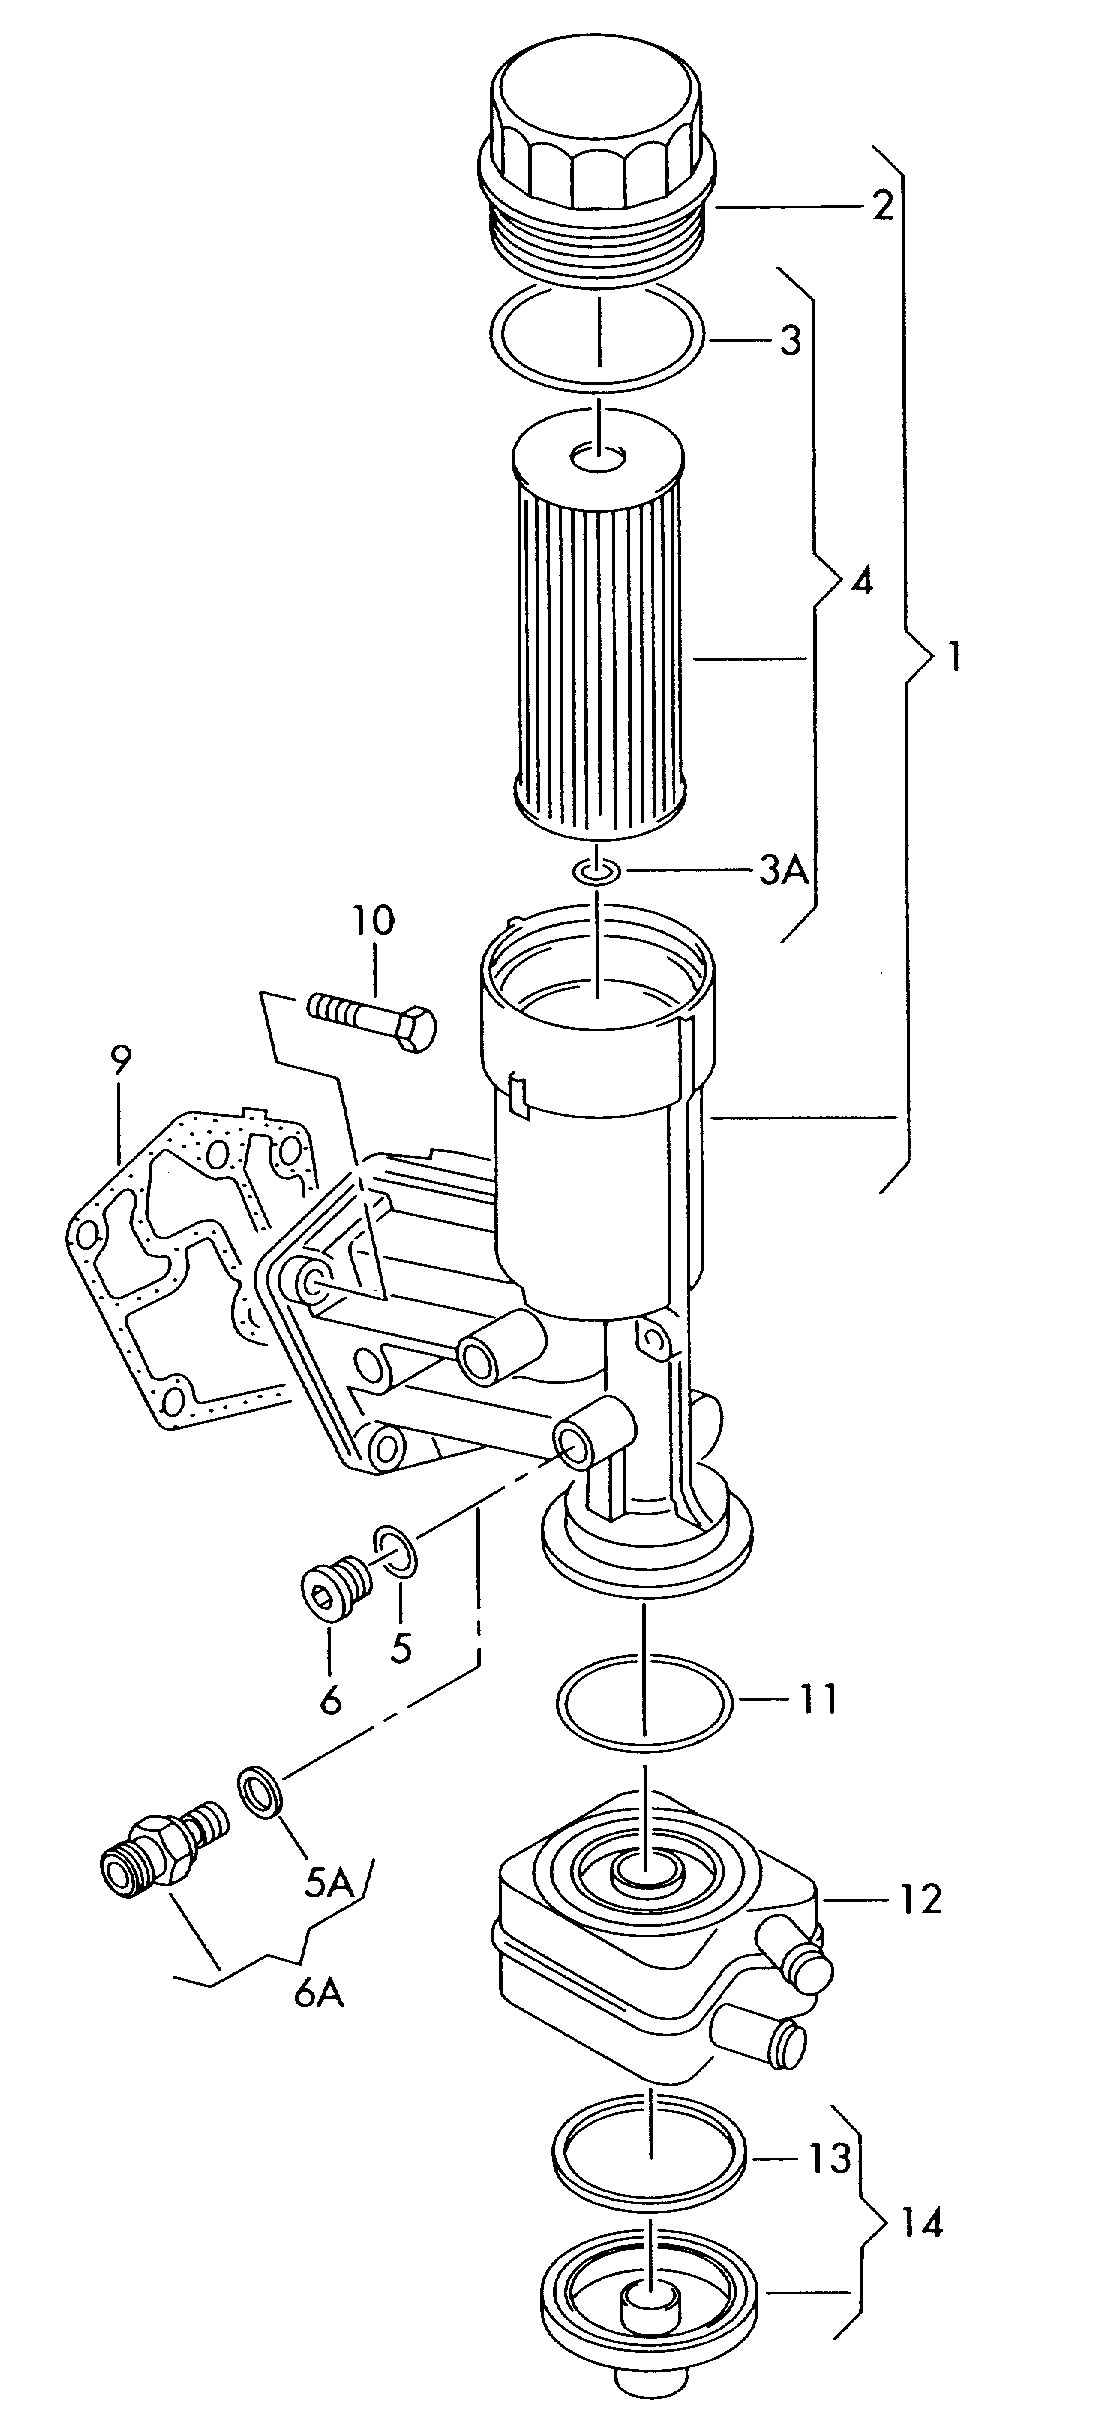 Vw Tiguan Engine